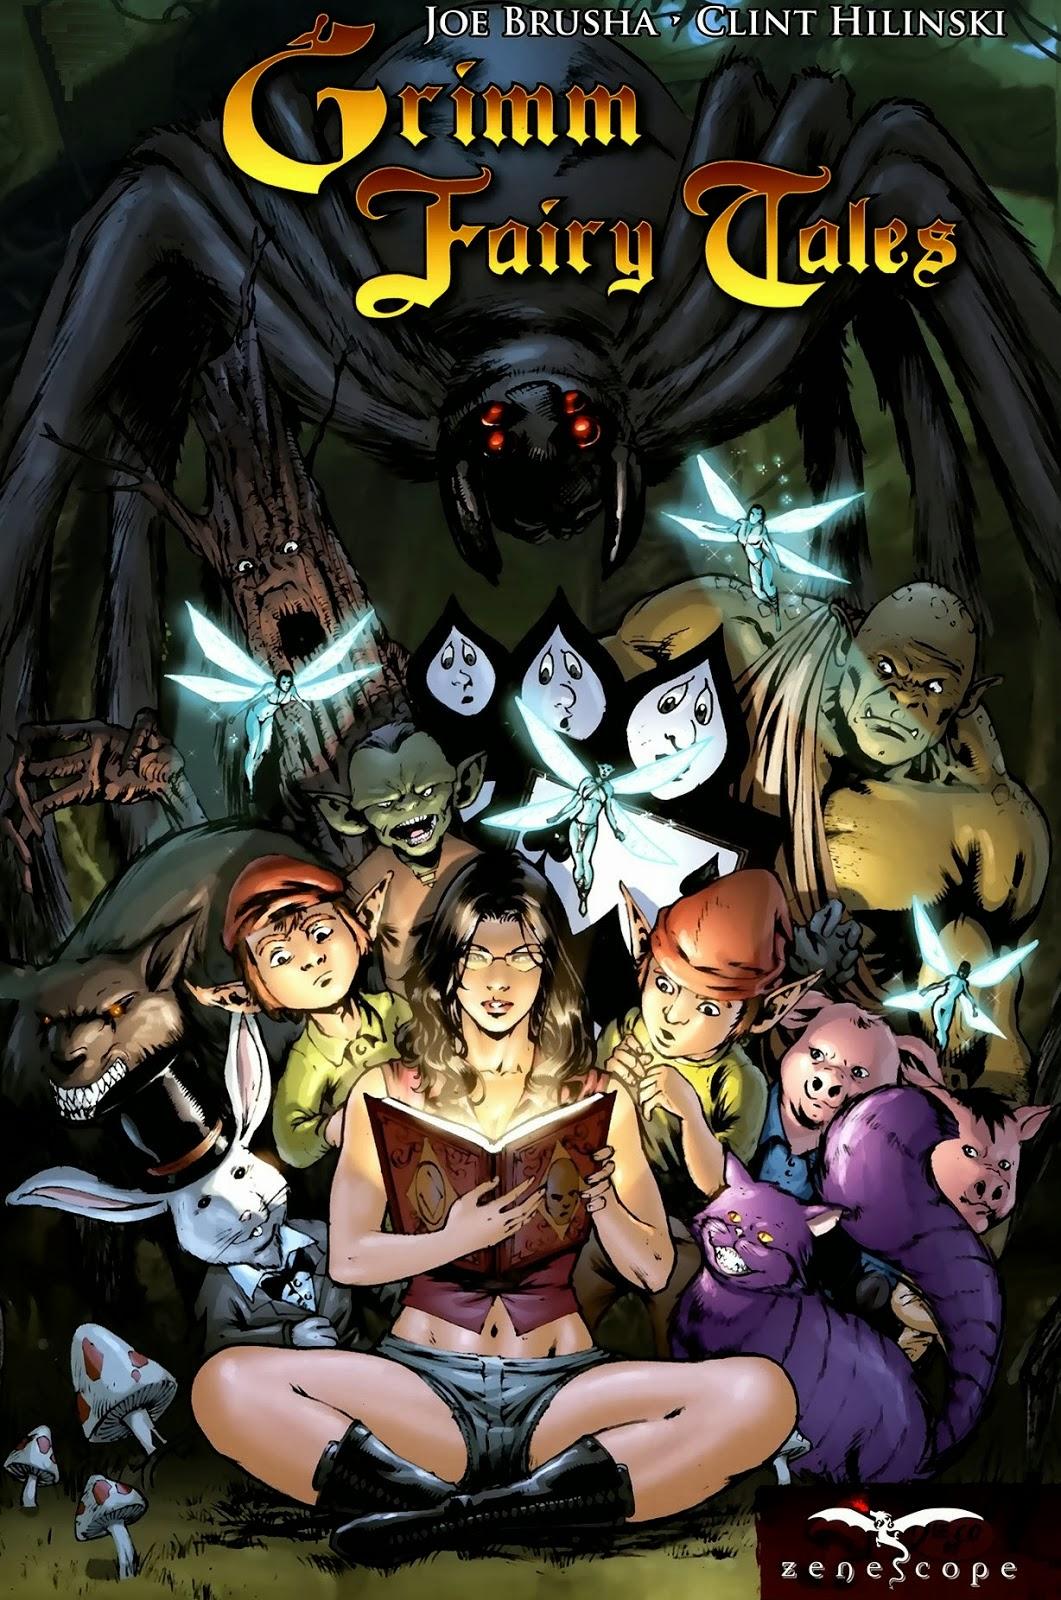 http://superheroesrevelados.blogspot.com.ar/2014/01/grimm-fairy-tales.html